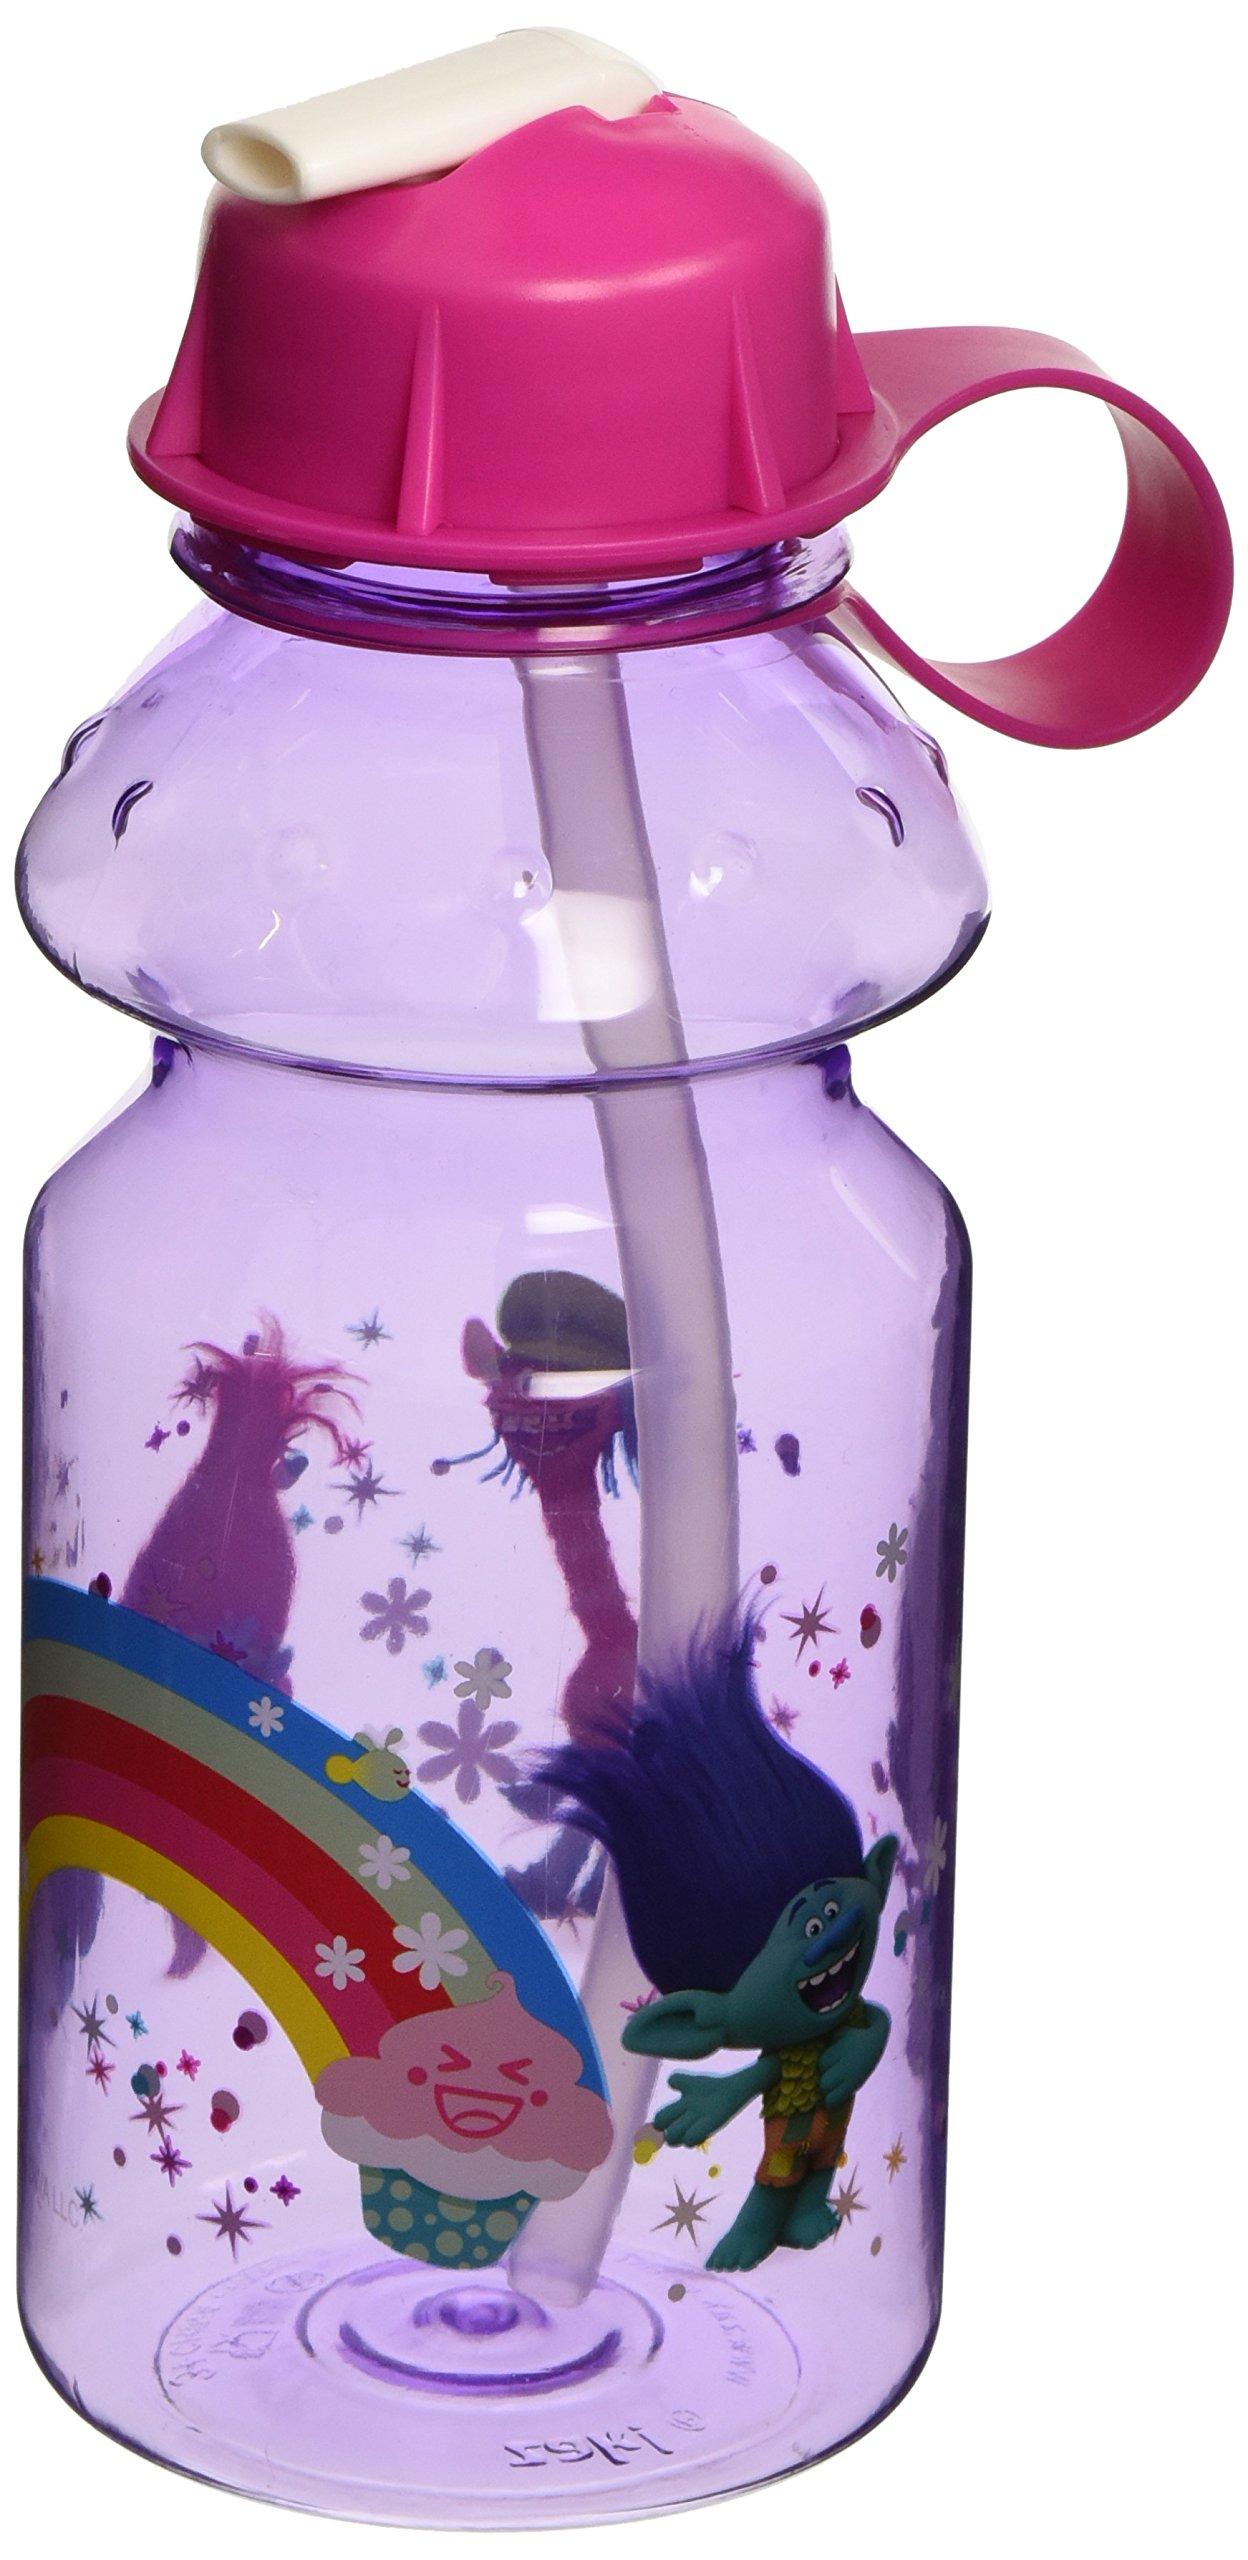 Zak Designs TROF-K870-B Trolls Movie 14 oz. Water Bottle with Flip Straw, Poppy, Branch, Cooper & Guy Diamond